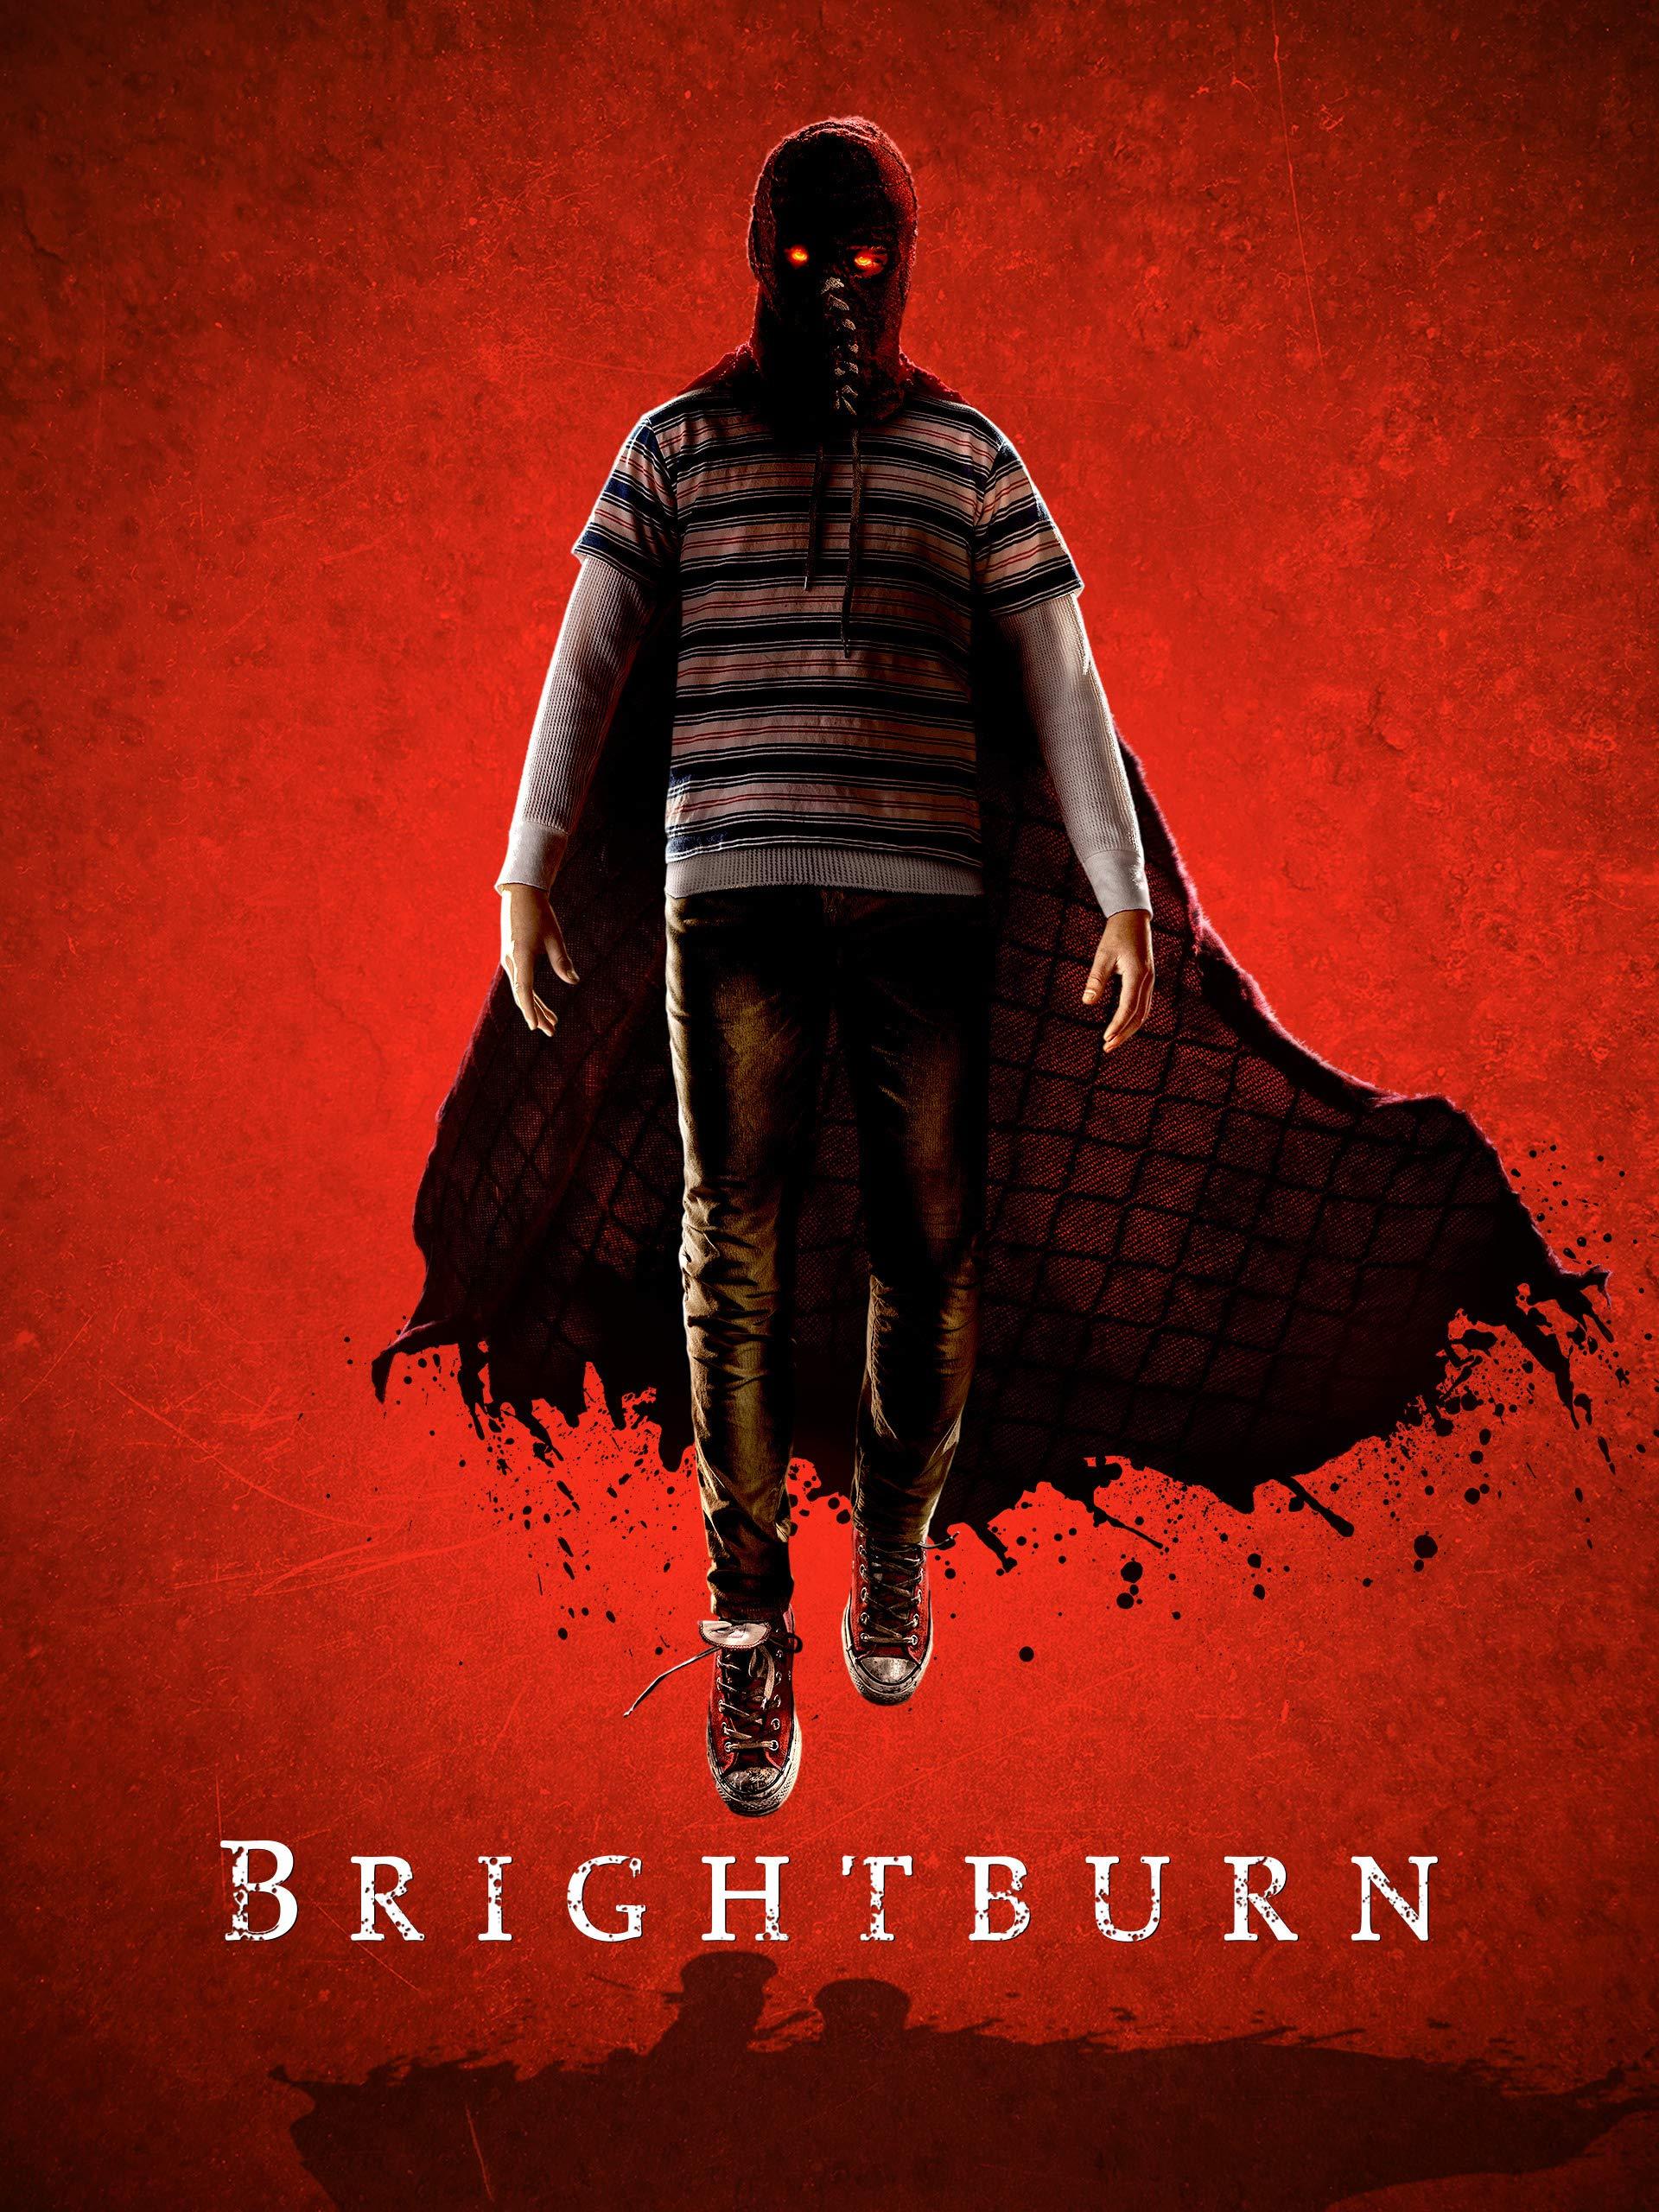 Amazon.com: Brightburn: Elizabeth Banks, David Denman, Jackson Dunn ...